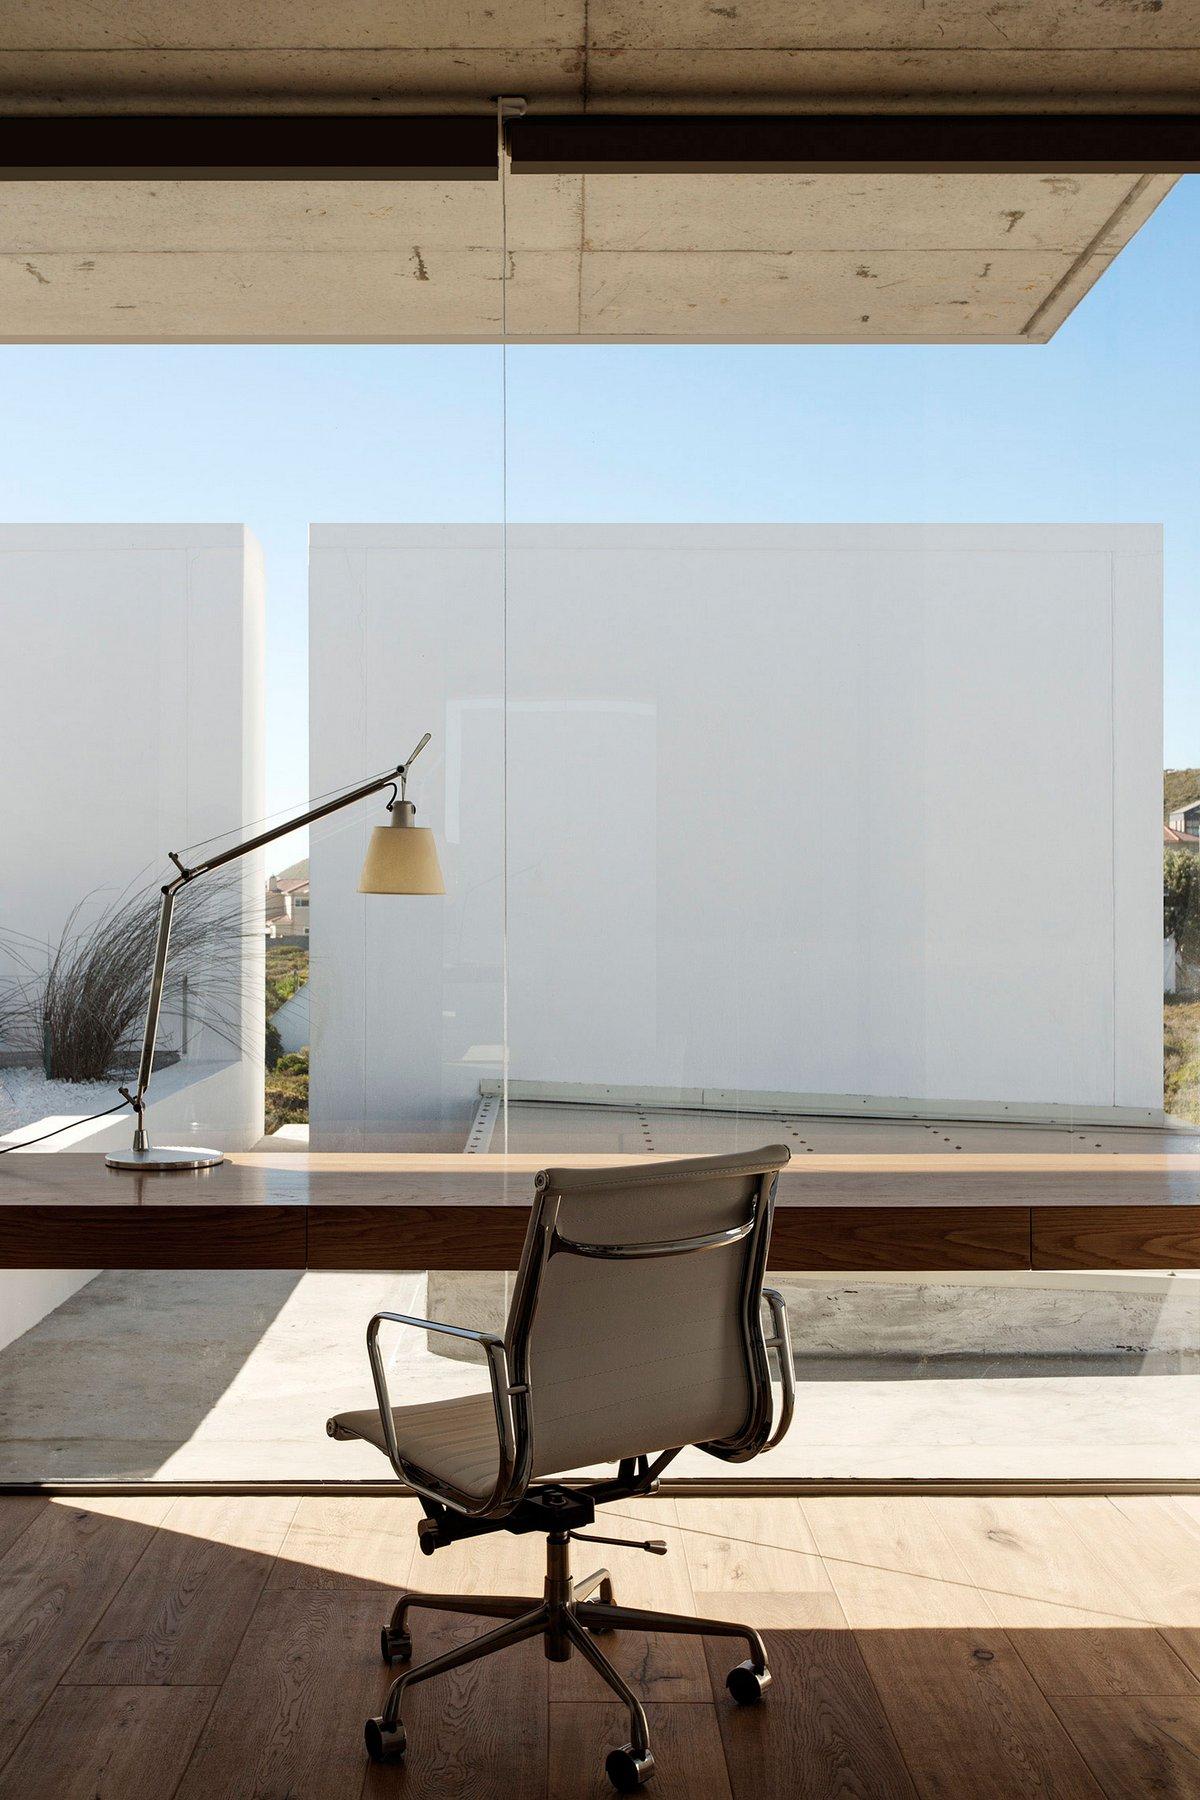 Gavin Maddock Design Studio, Pearl Bay Residence, особняки в Кейптауне, особняки в ЮАР, дом на берегу океана, дом с видом на океан